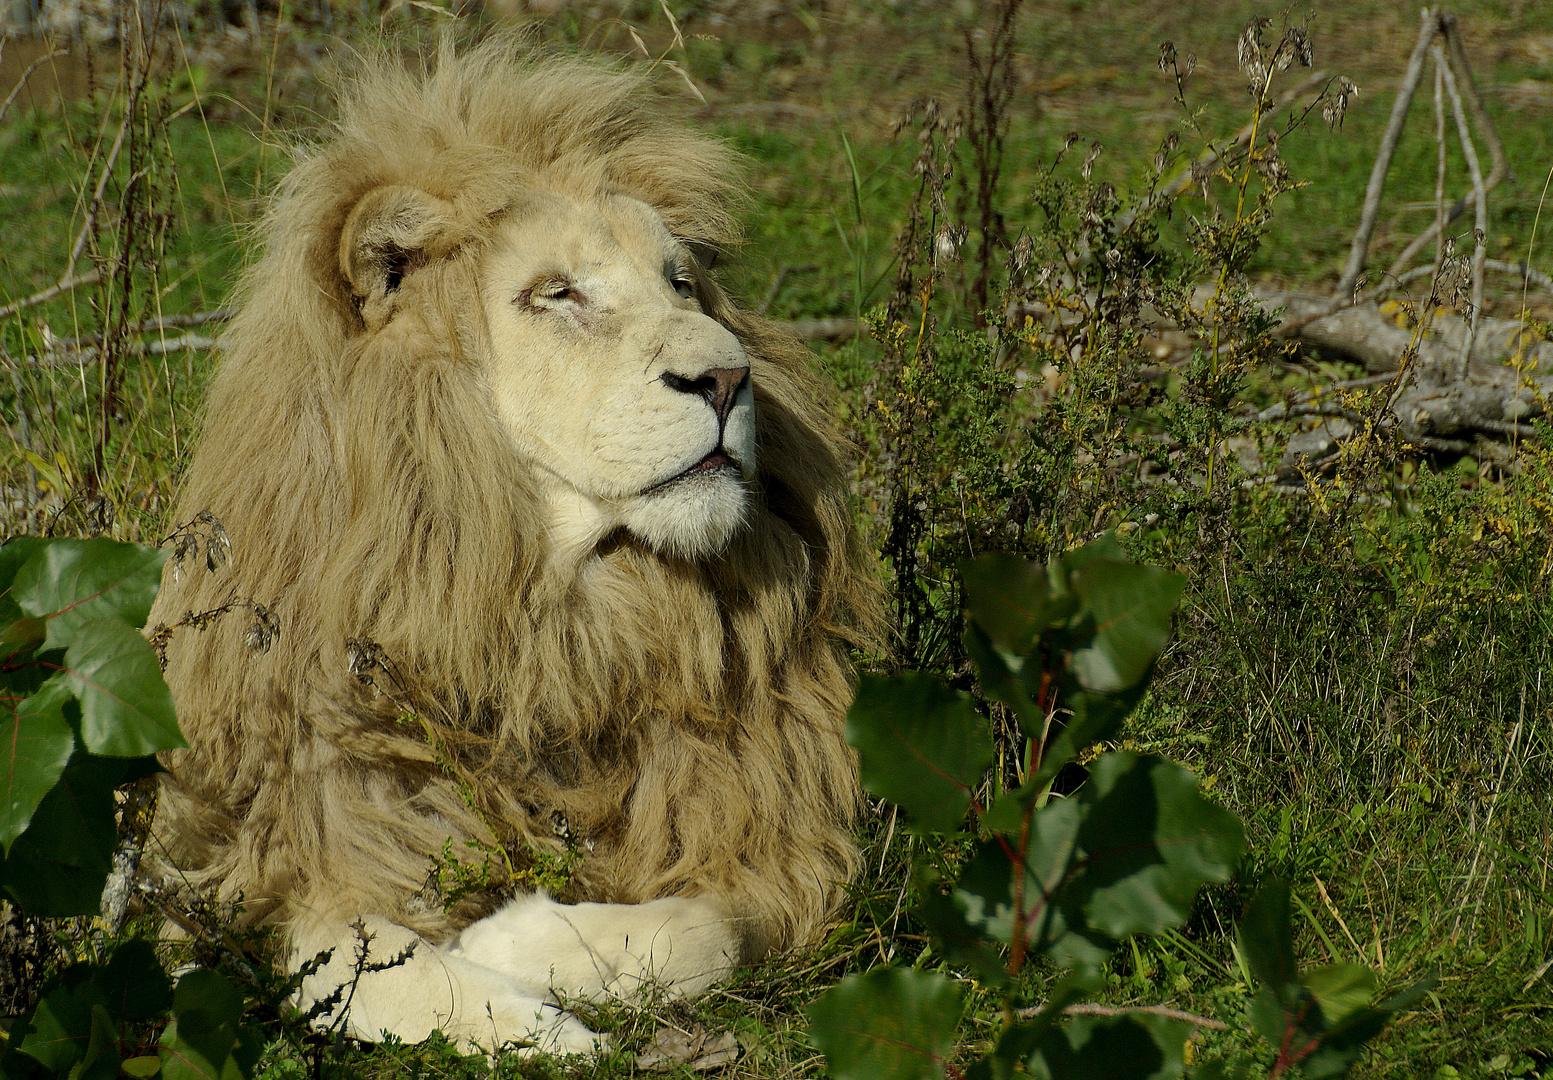 lion blanc de krüger, mâle